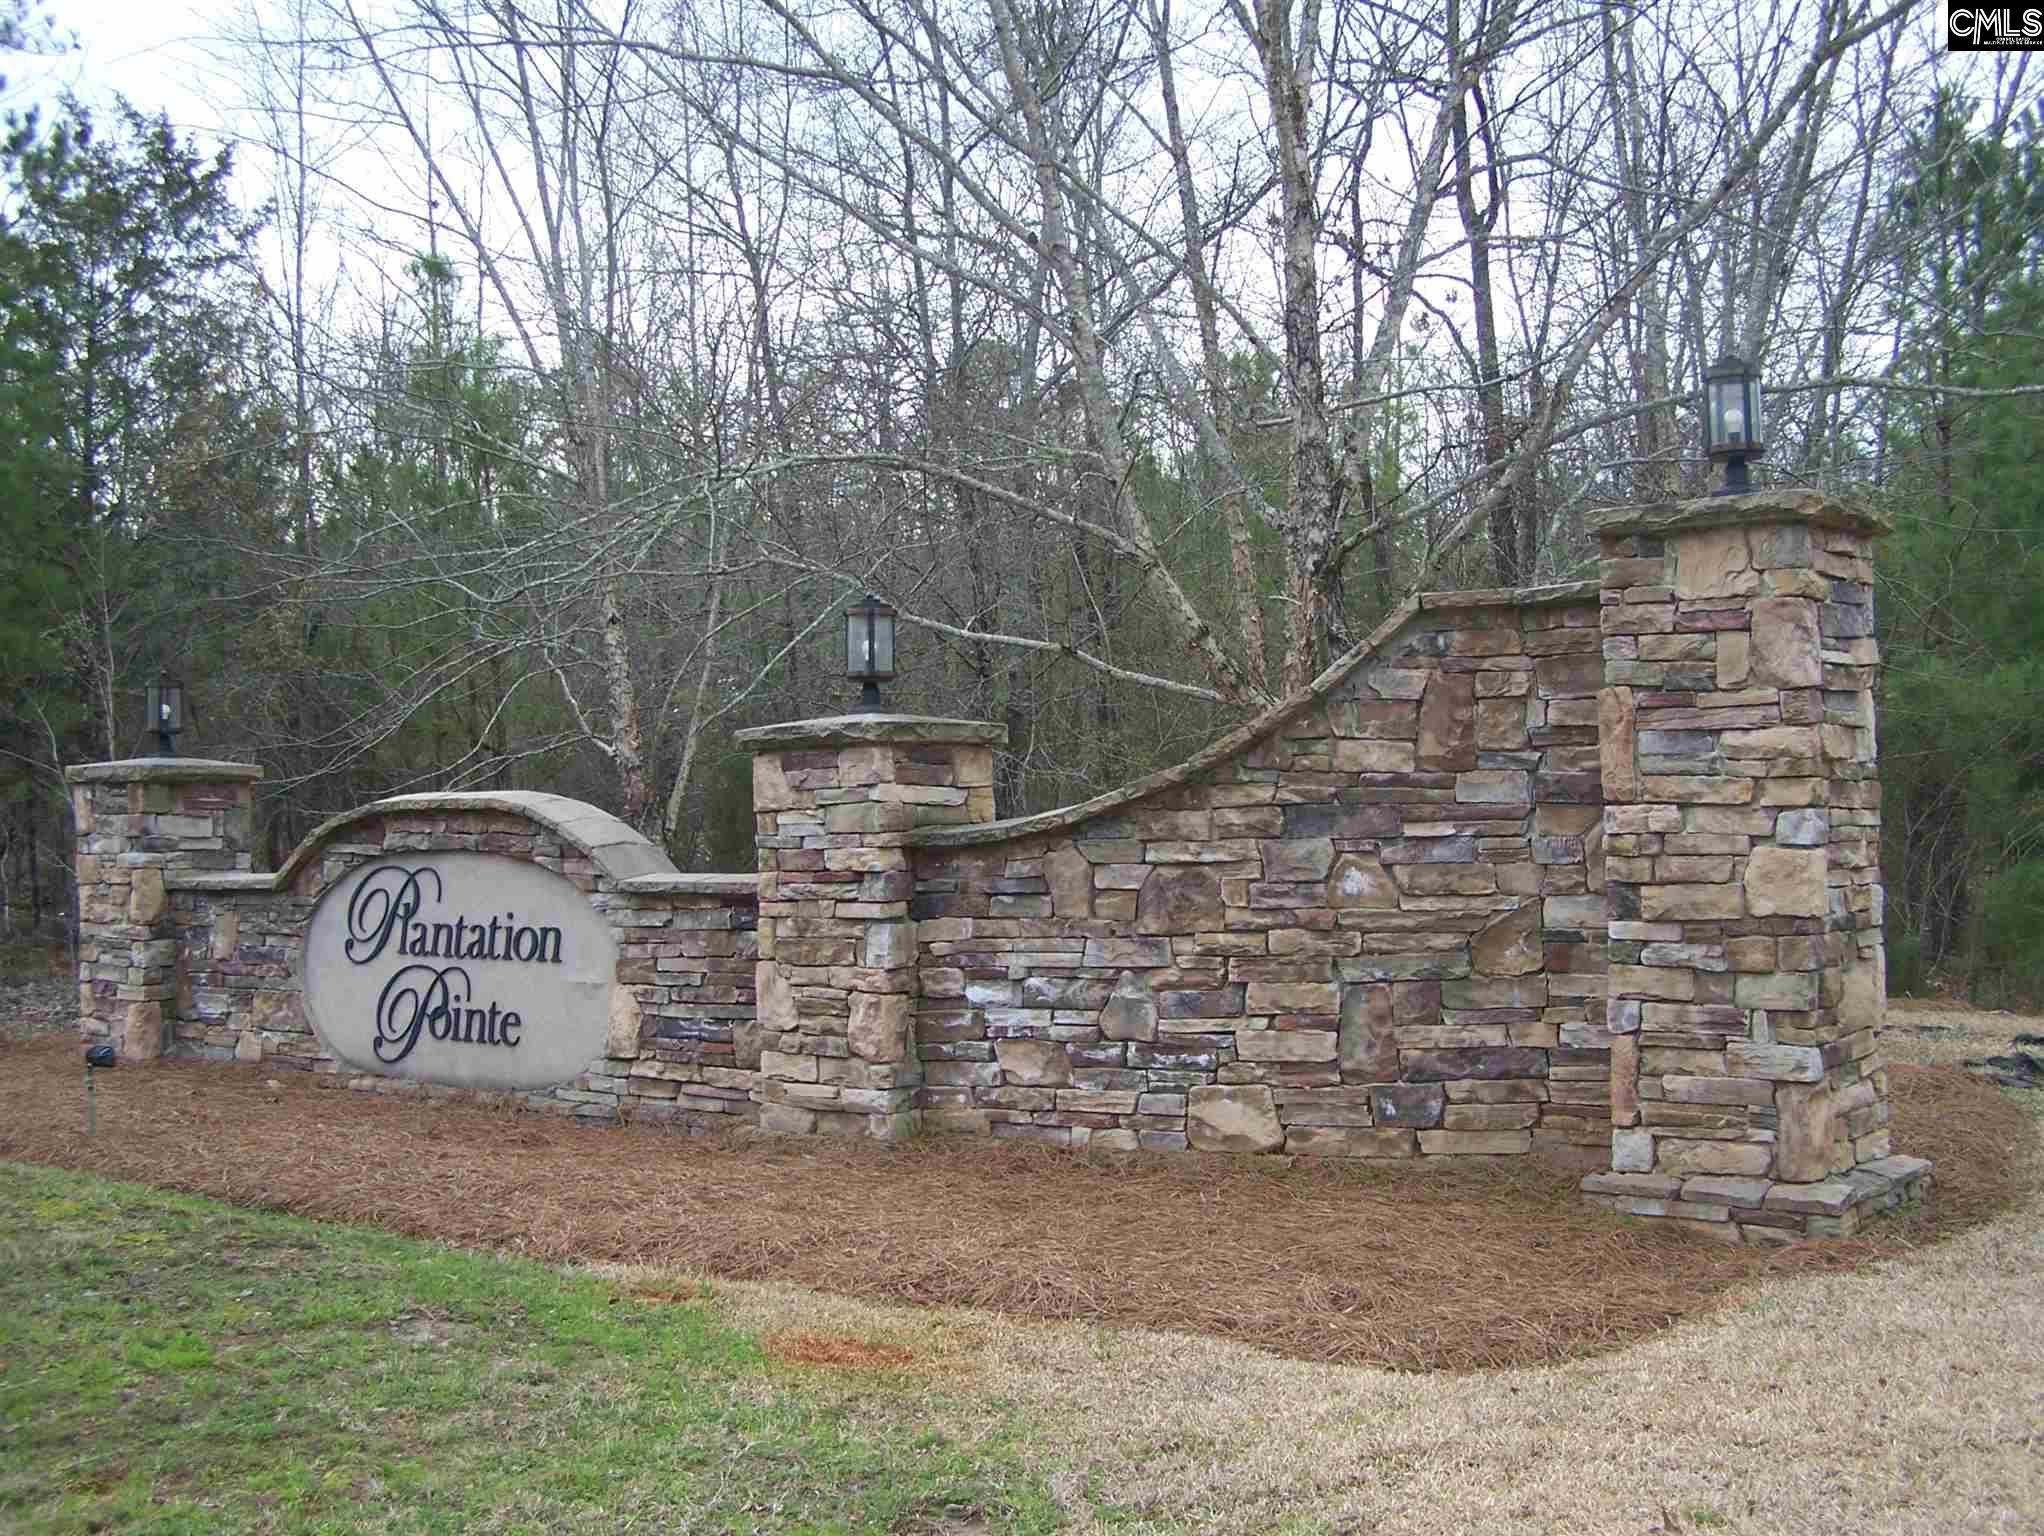 226 Plantation Pointe Ridgeway, SC 29130